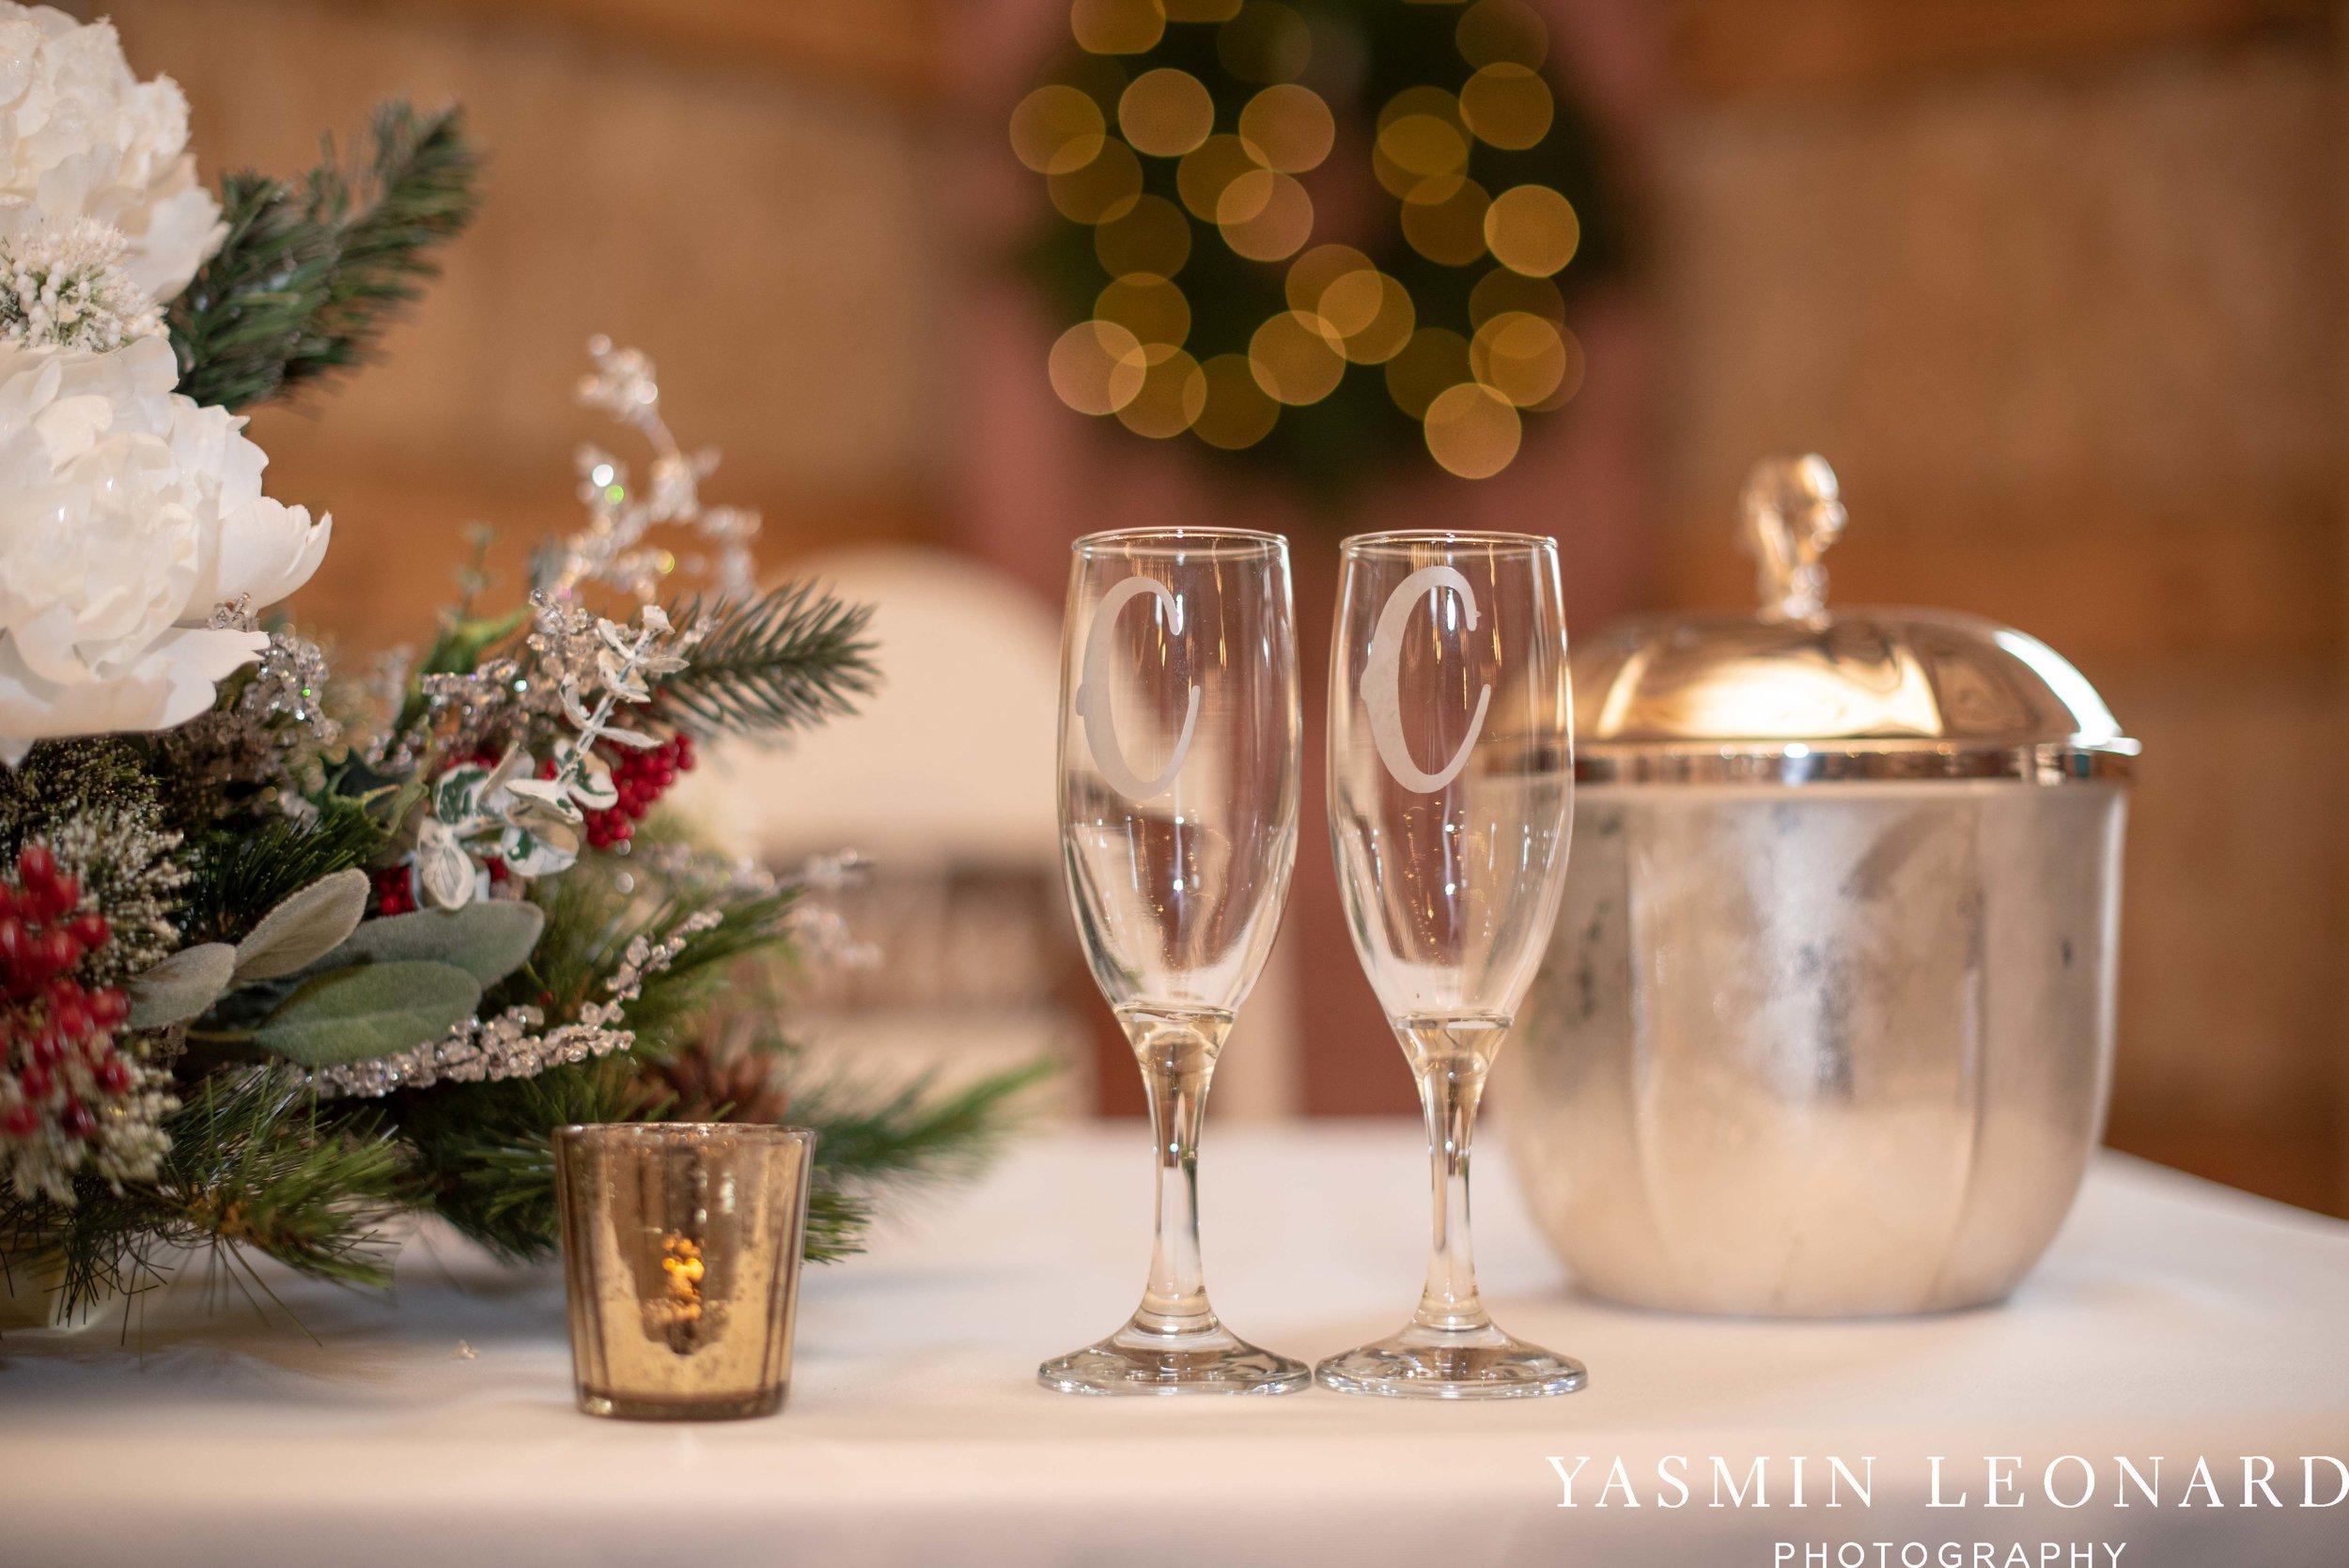 Secret Meadows at Green Dell Farm, NC Barns, NC Wedding Venues, Triad, NC, NC Wedding Photography, Triad Wedding Venues, Affordable Wedding Venues, NEW Wedding Venues, Christmas Weddings-34.jpg